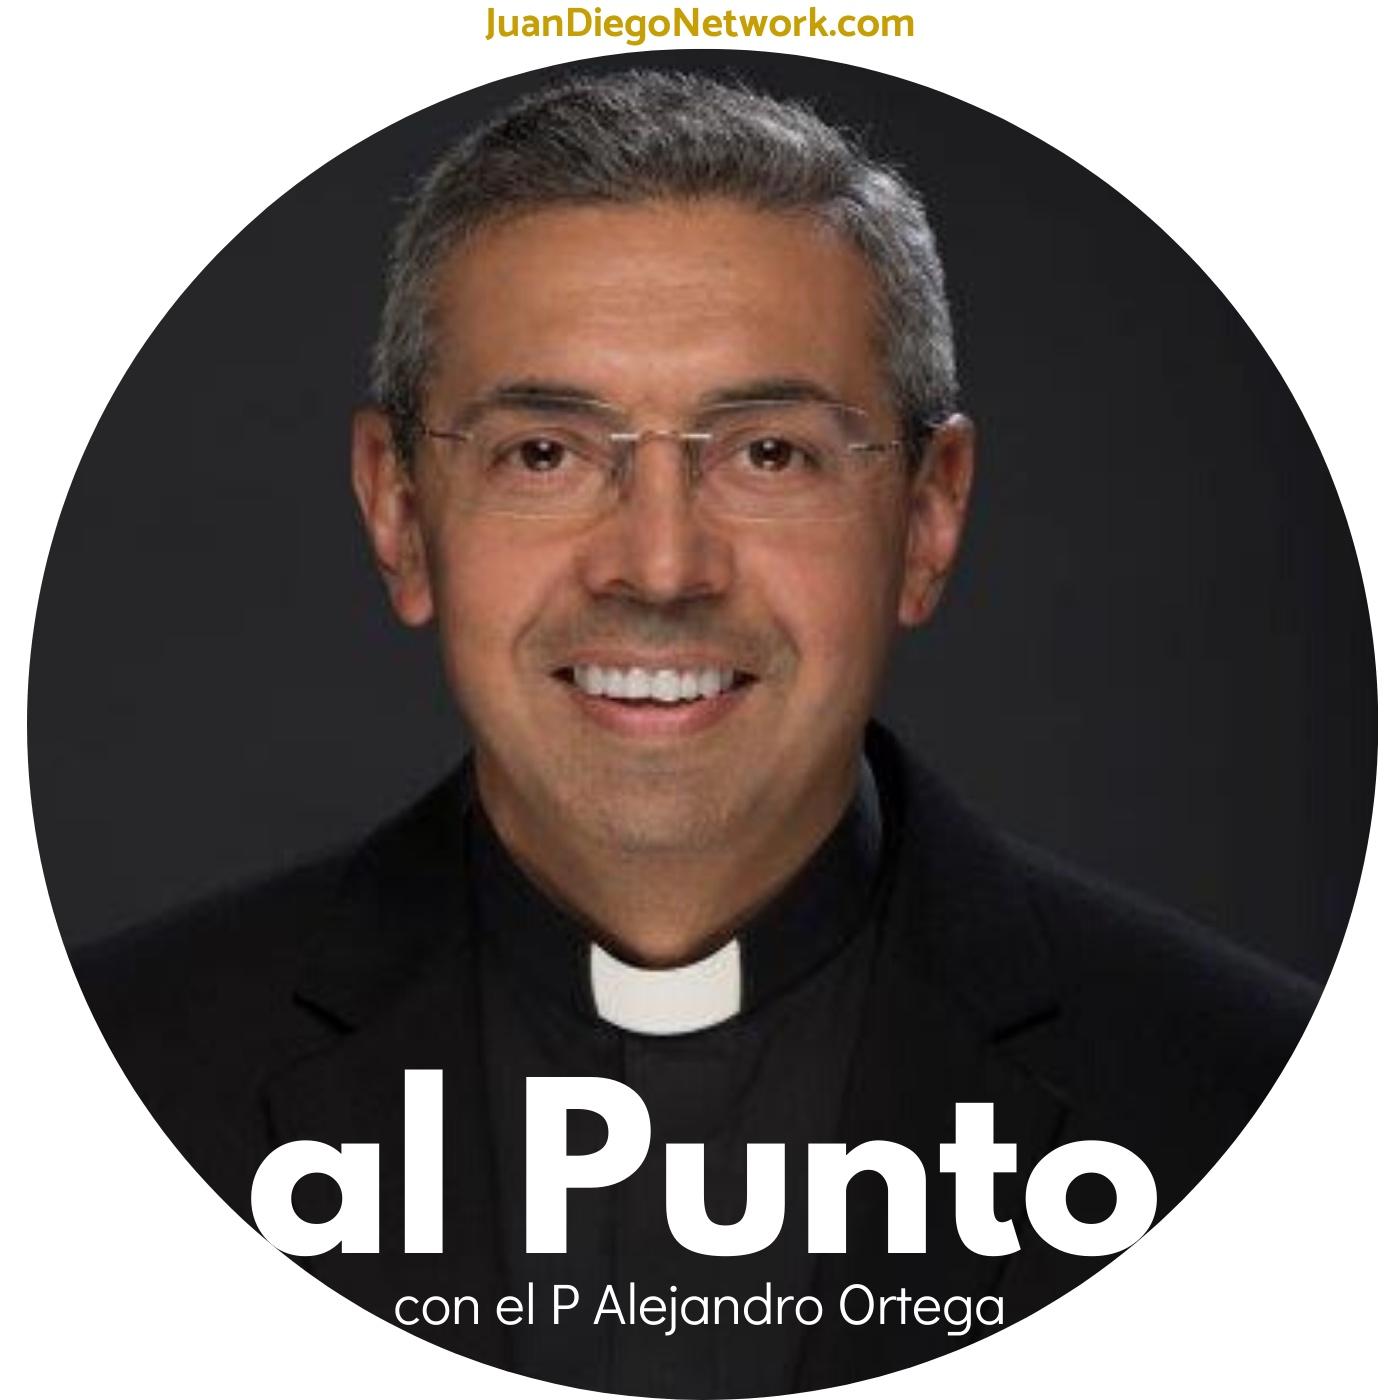 Artwork for podcast al Punto con el P Alejandro Ortega